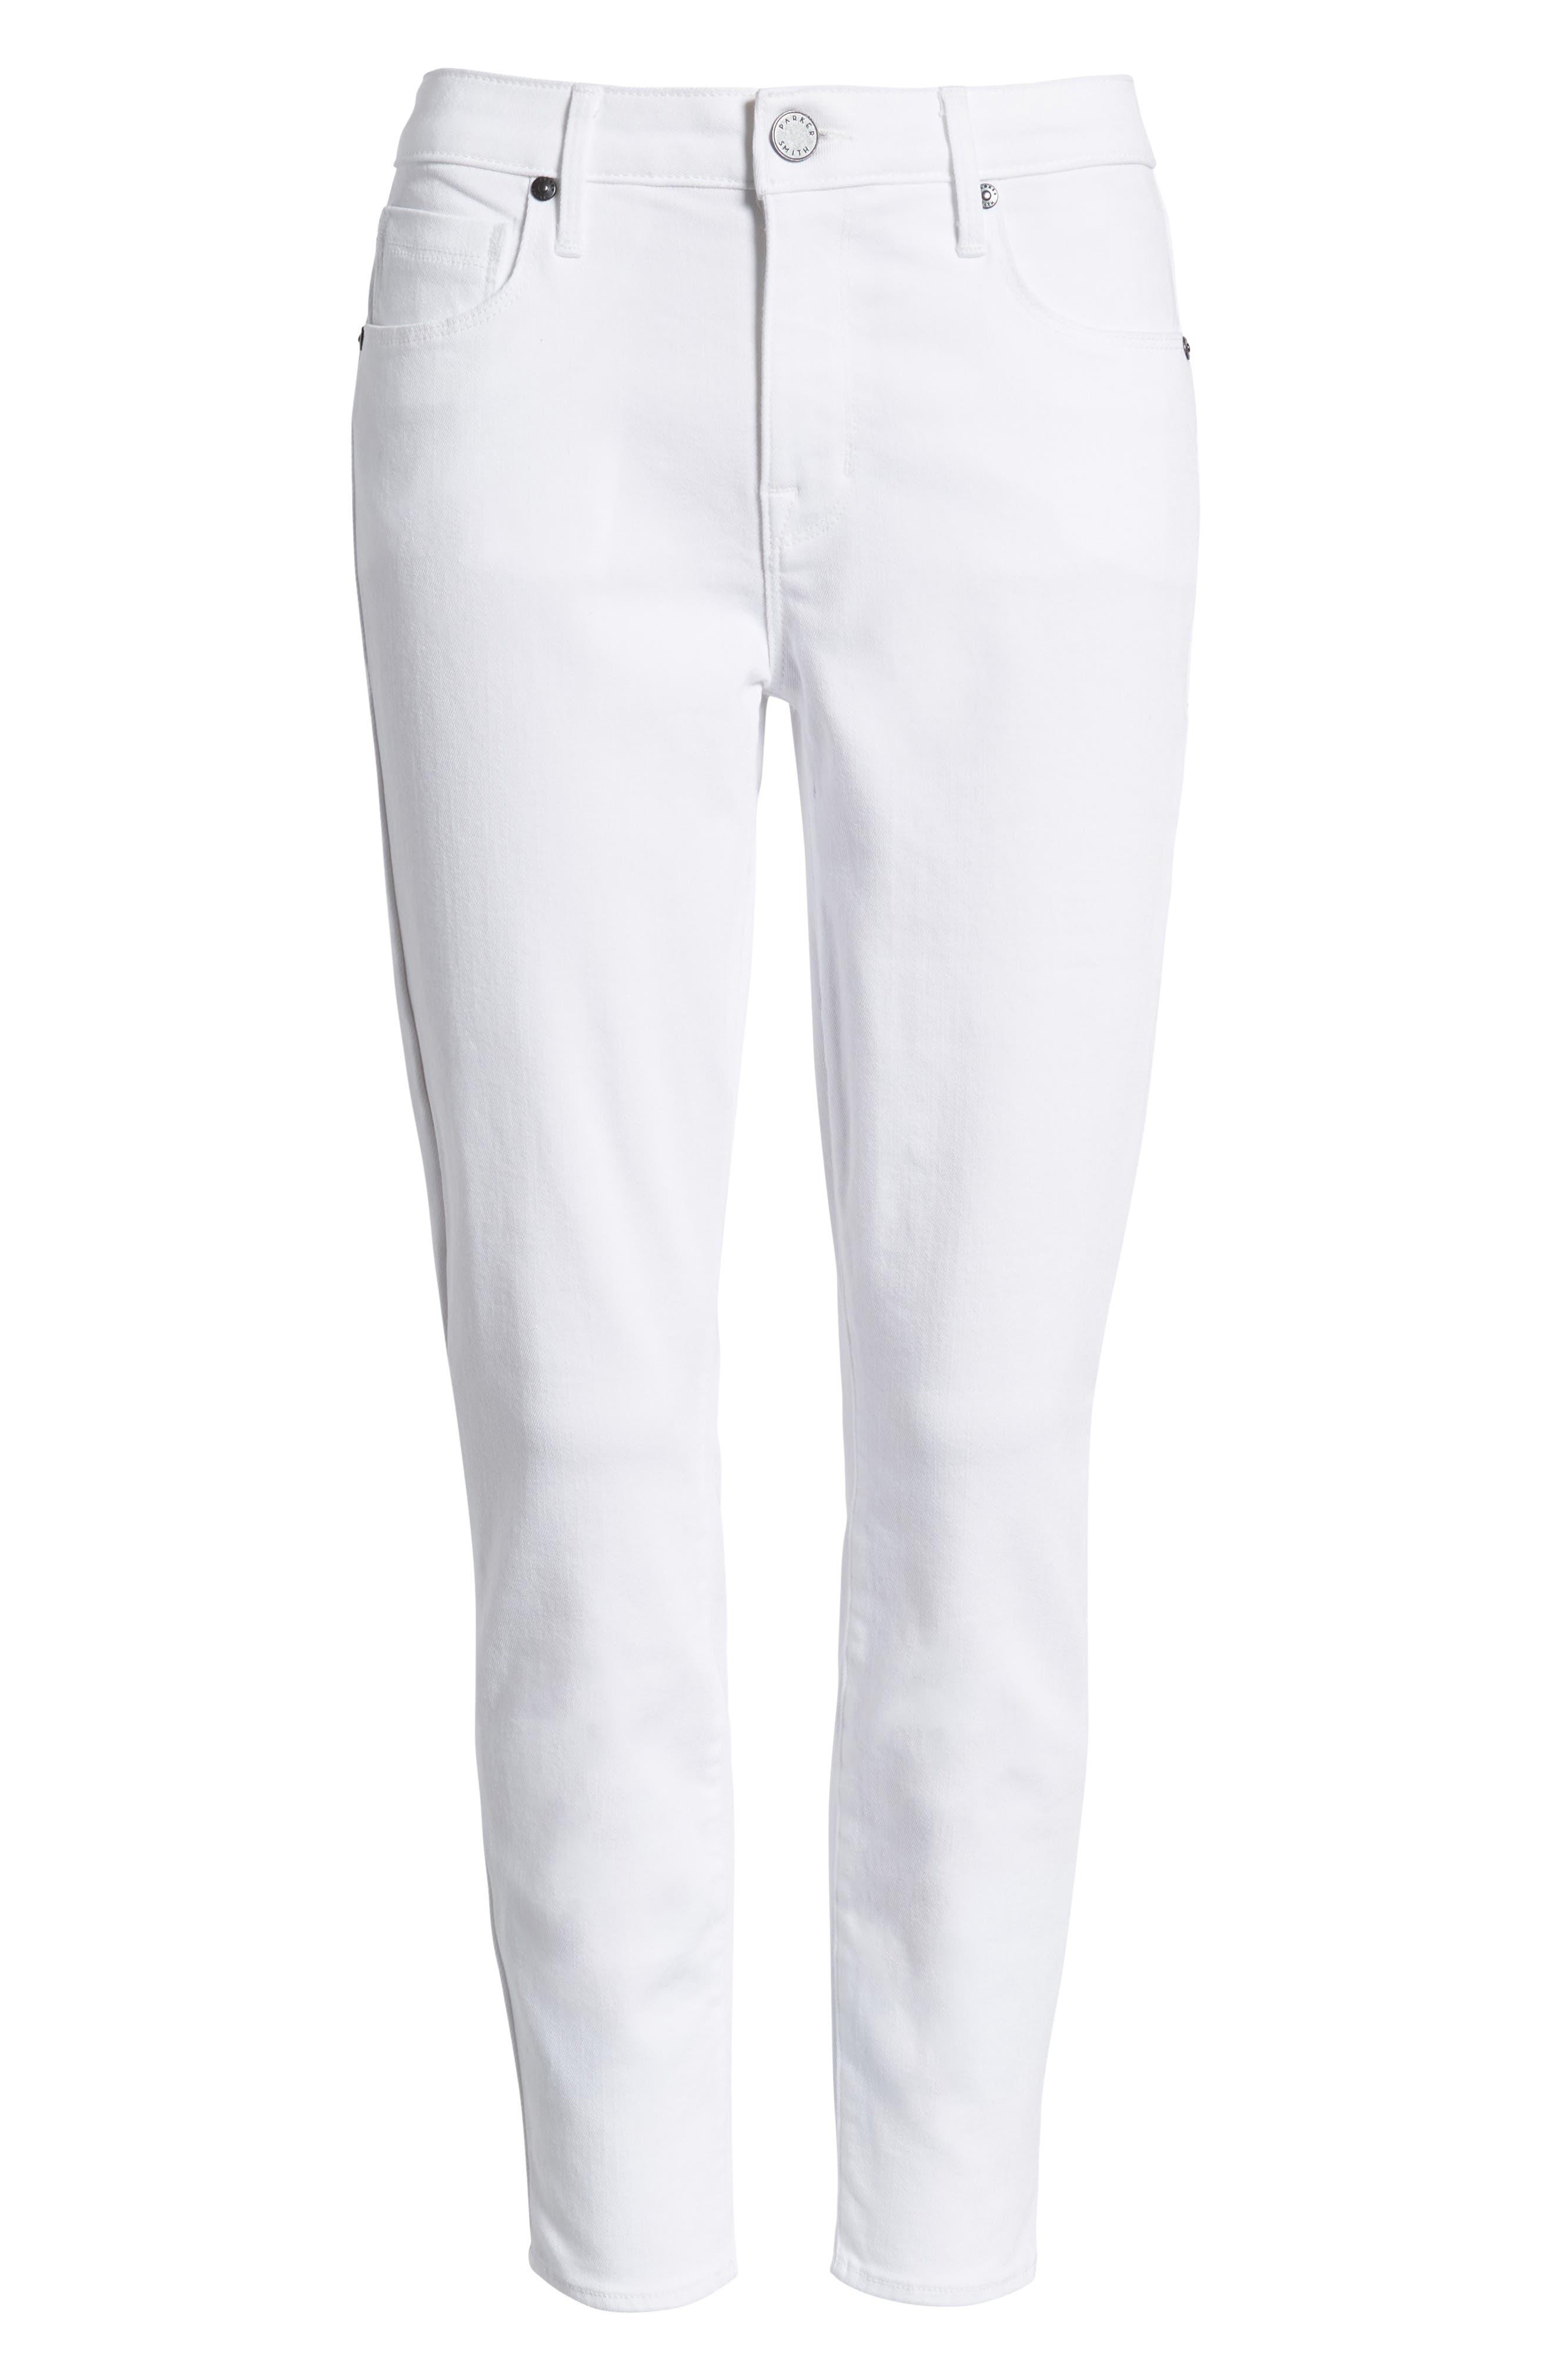 Ava Crop Skinny Jeans,                             Alternate thumbnail 7, color,                             100